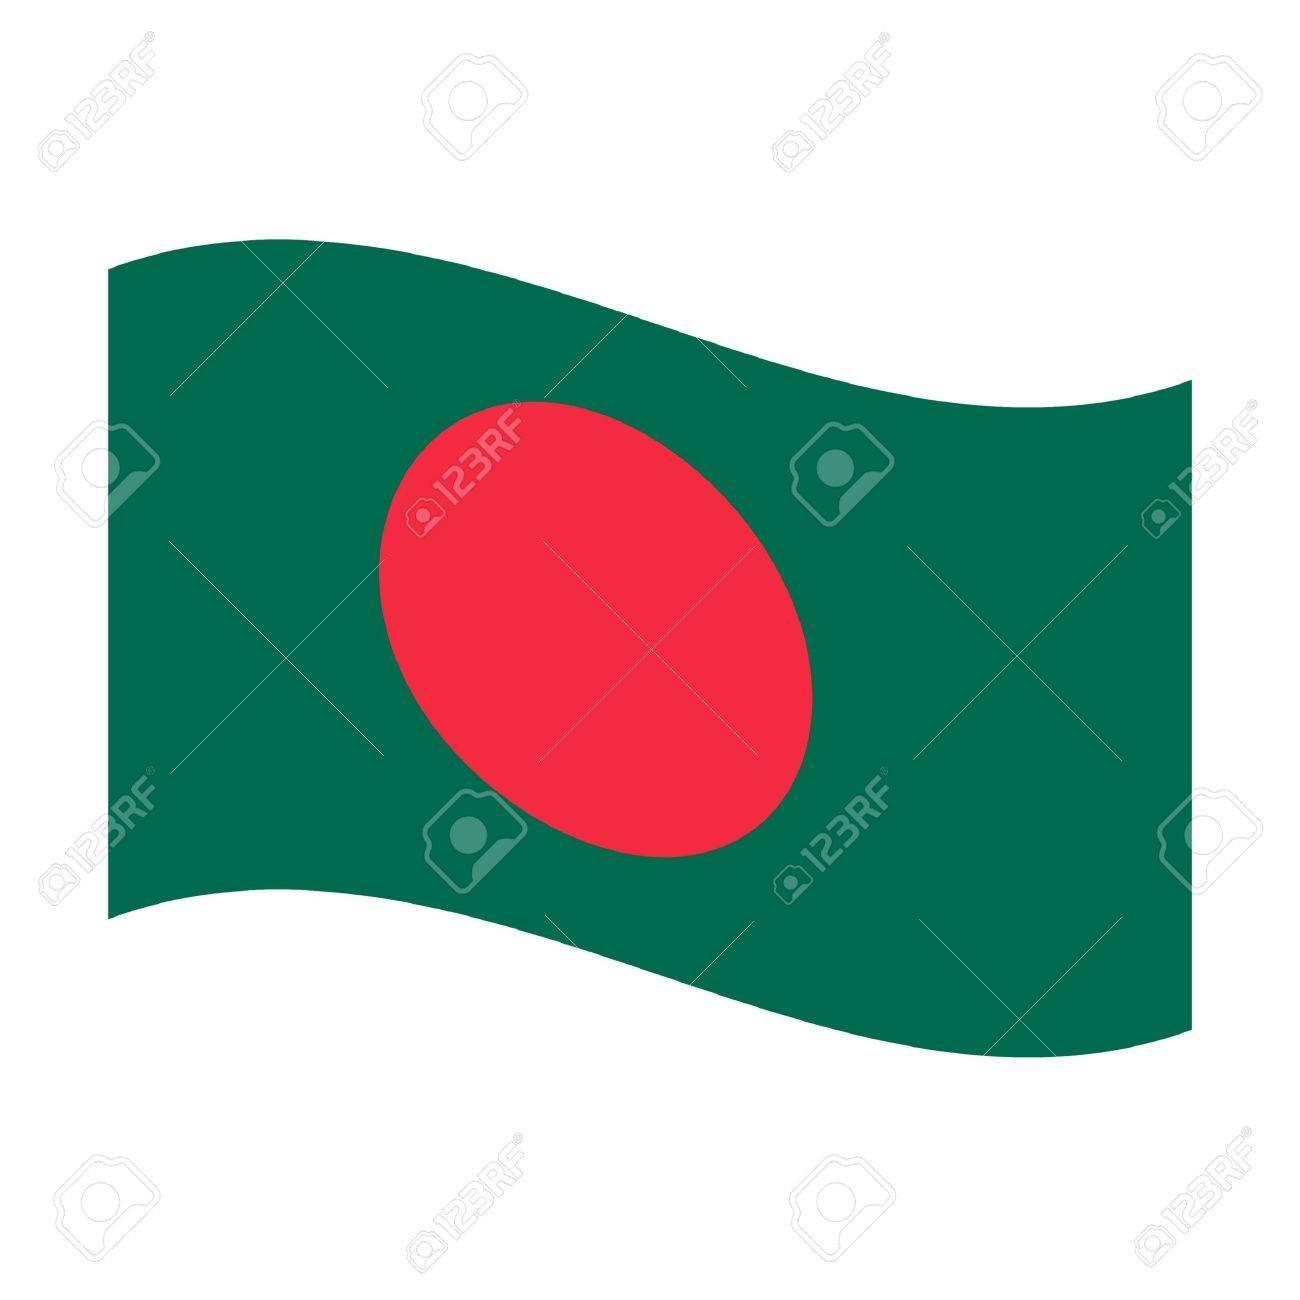 Illustration of the national flag of bangladesh floating Stock Illustration - 6379843